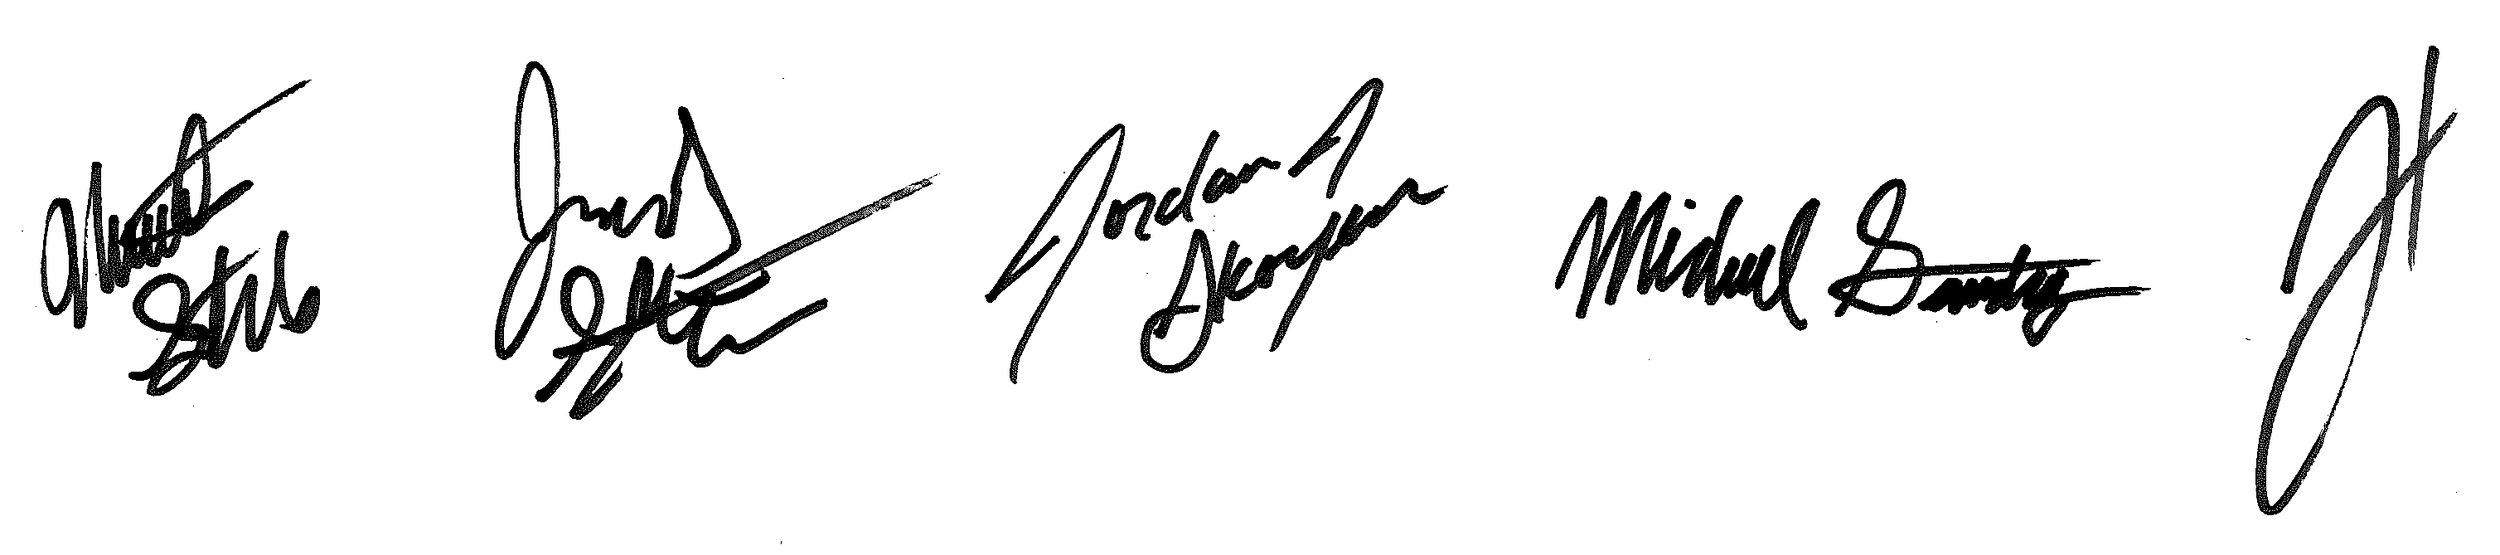 513FREE Band Signatures.jpg